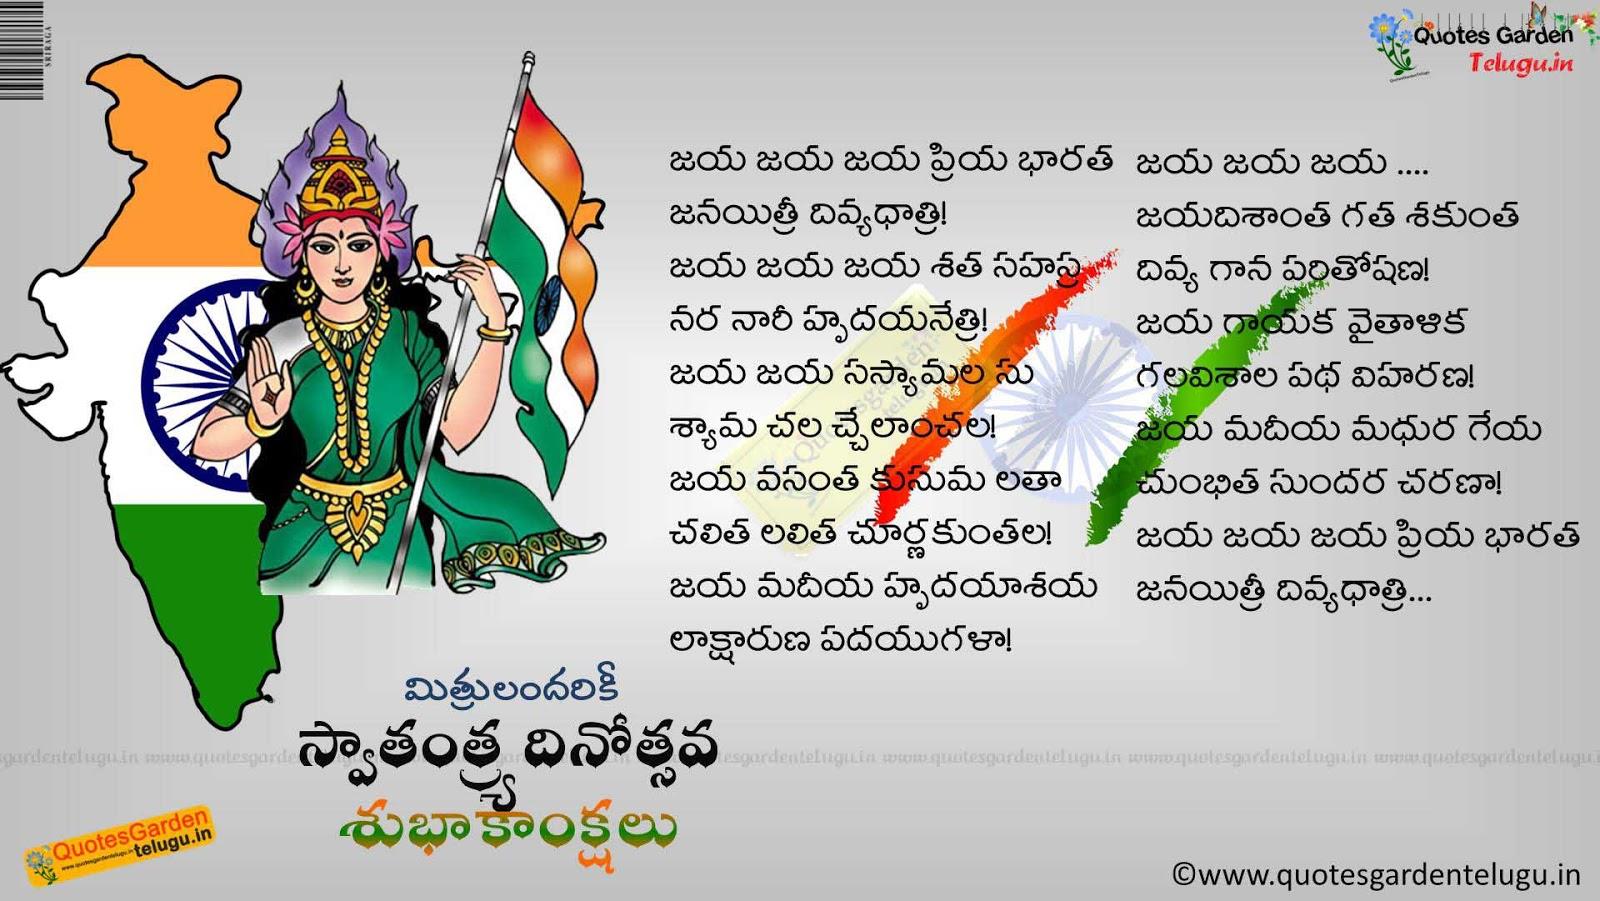 Lord krishna devotional songs telugu free download.